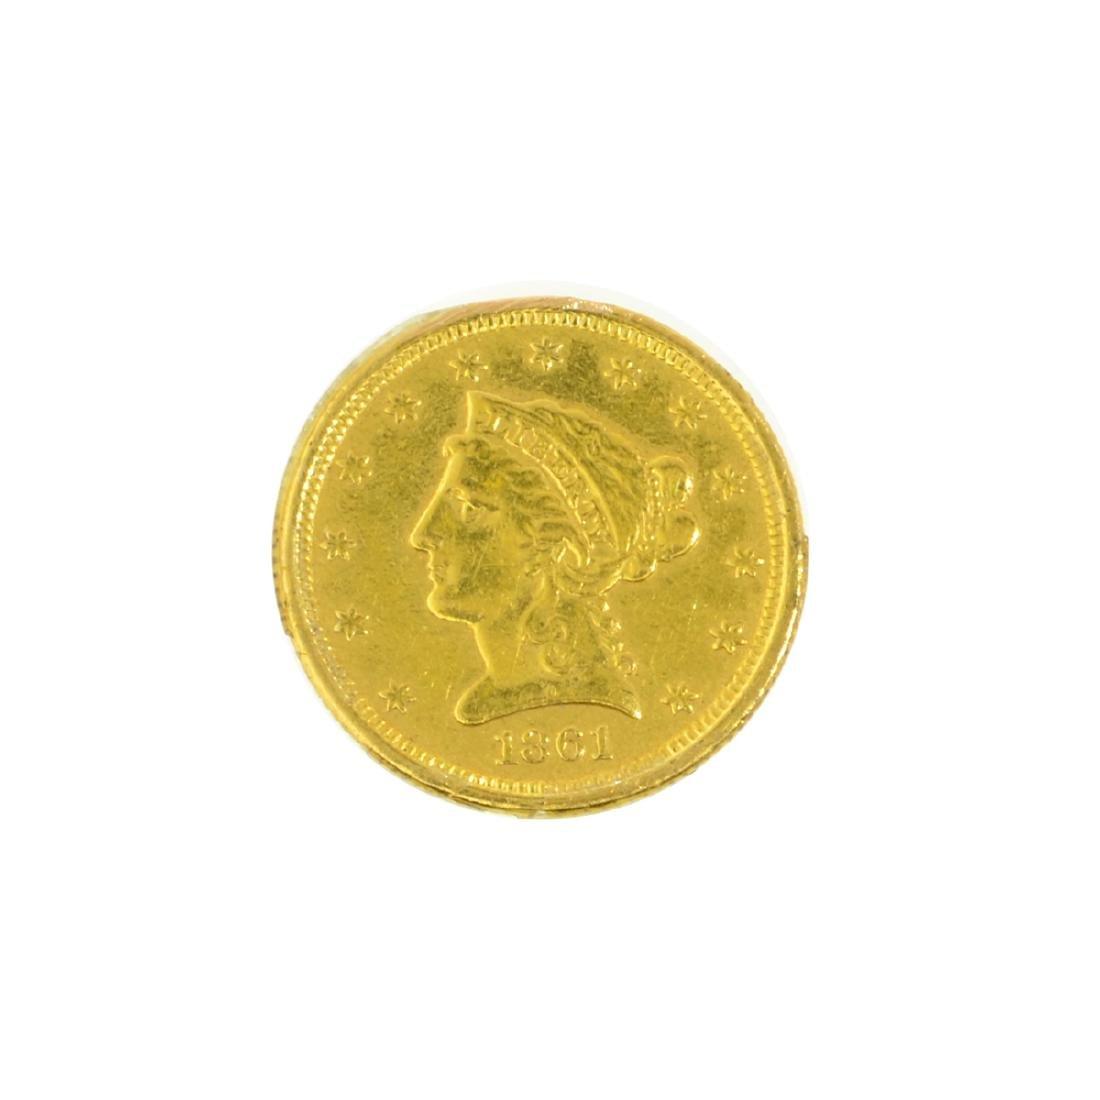 *1861 $2.50 U.S. Liberty Head Gold Coin (JG-MRT)